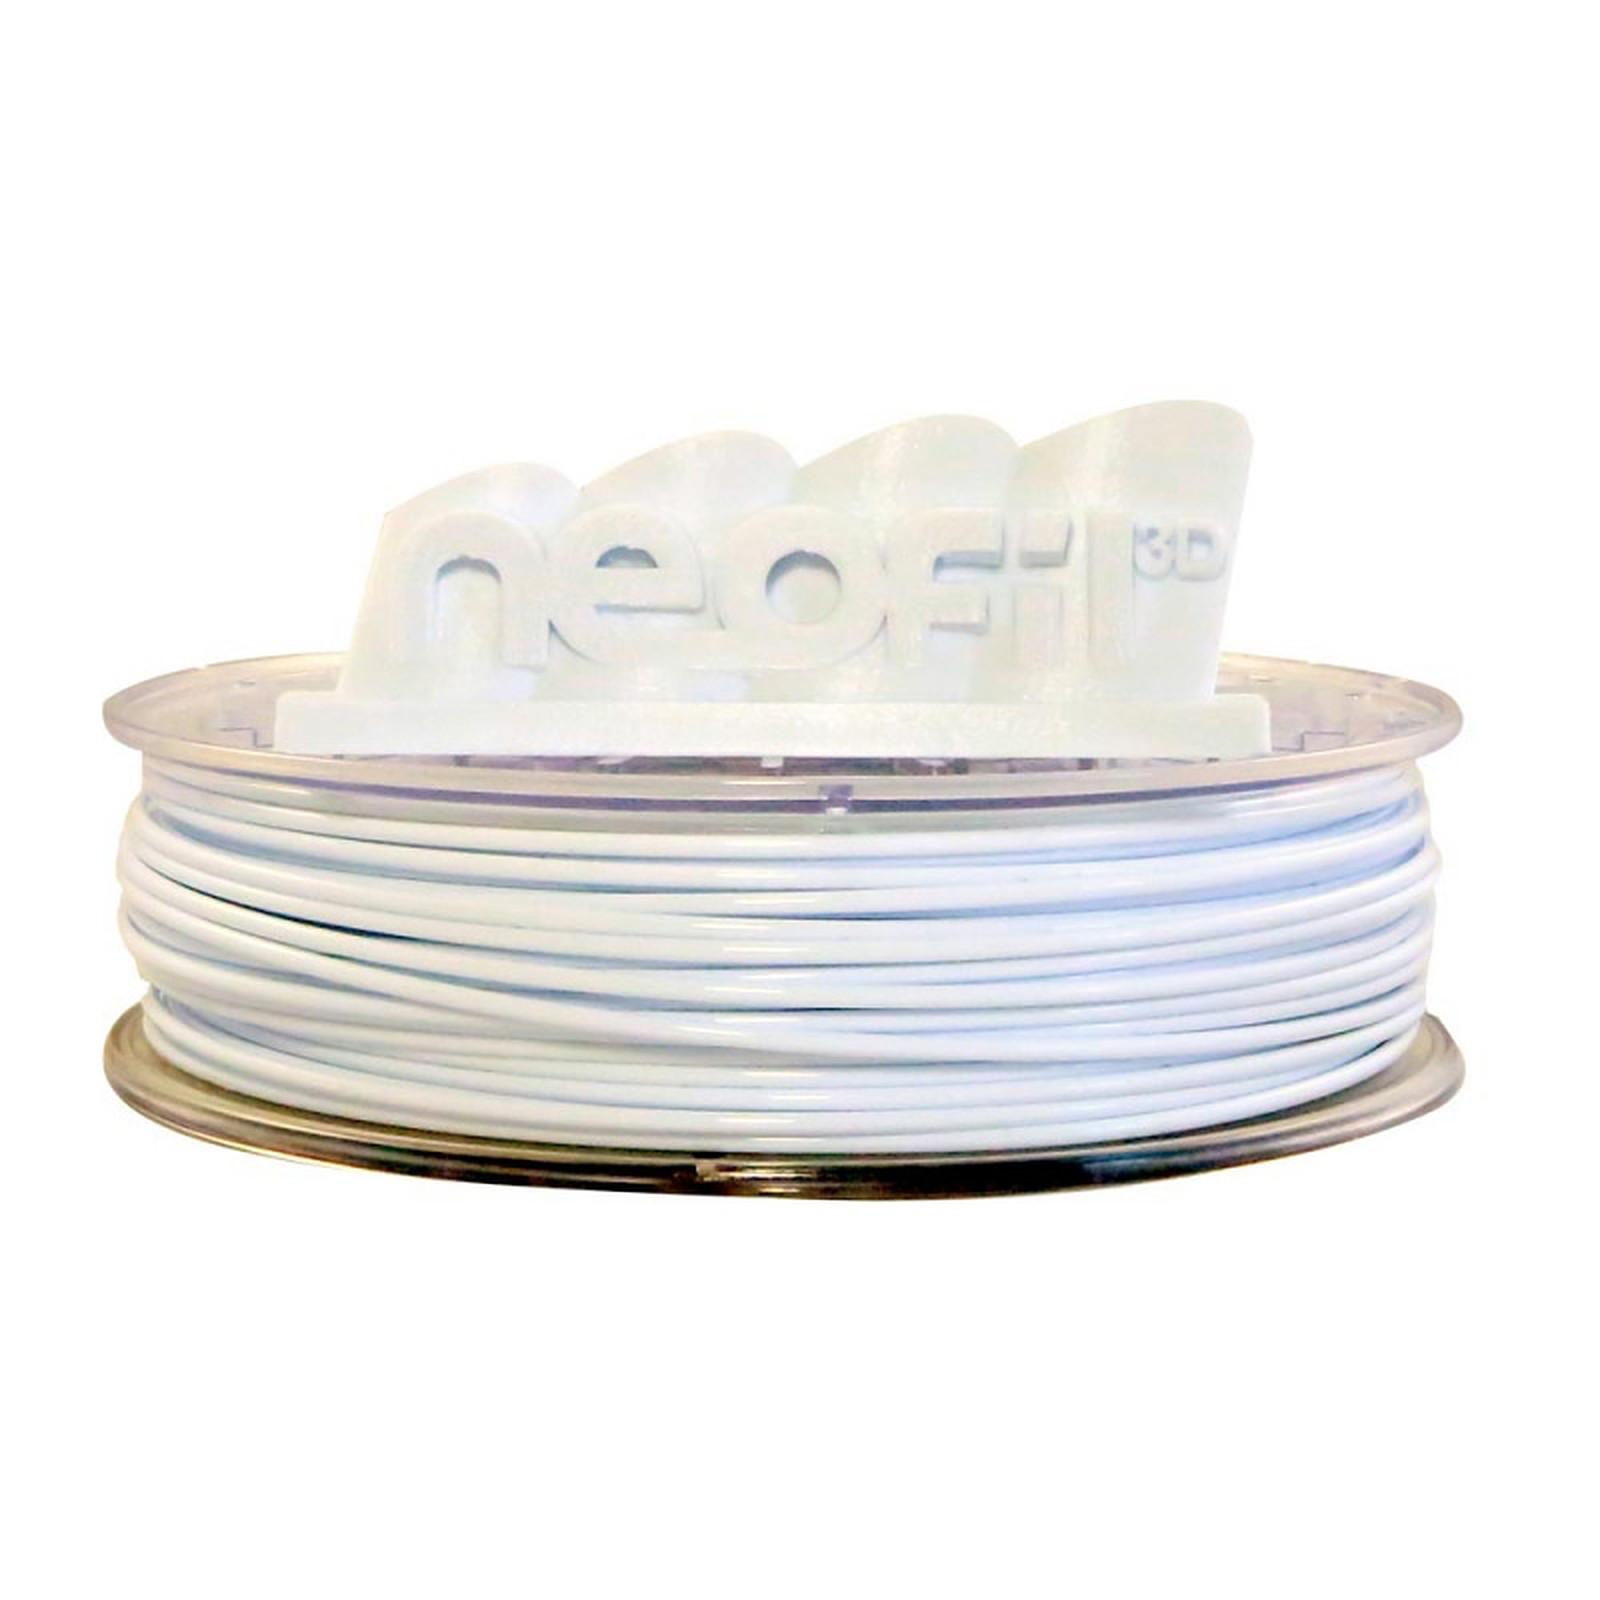 Neofil3D Bobine PET-G 2.85mm 750g - Blanc